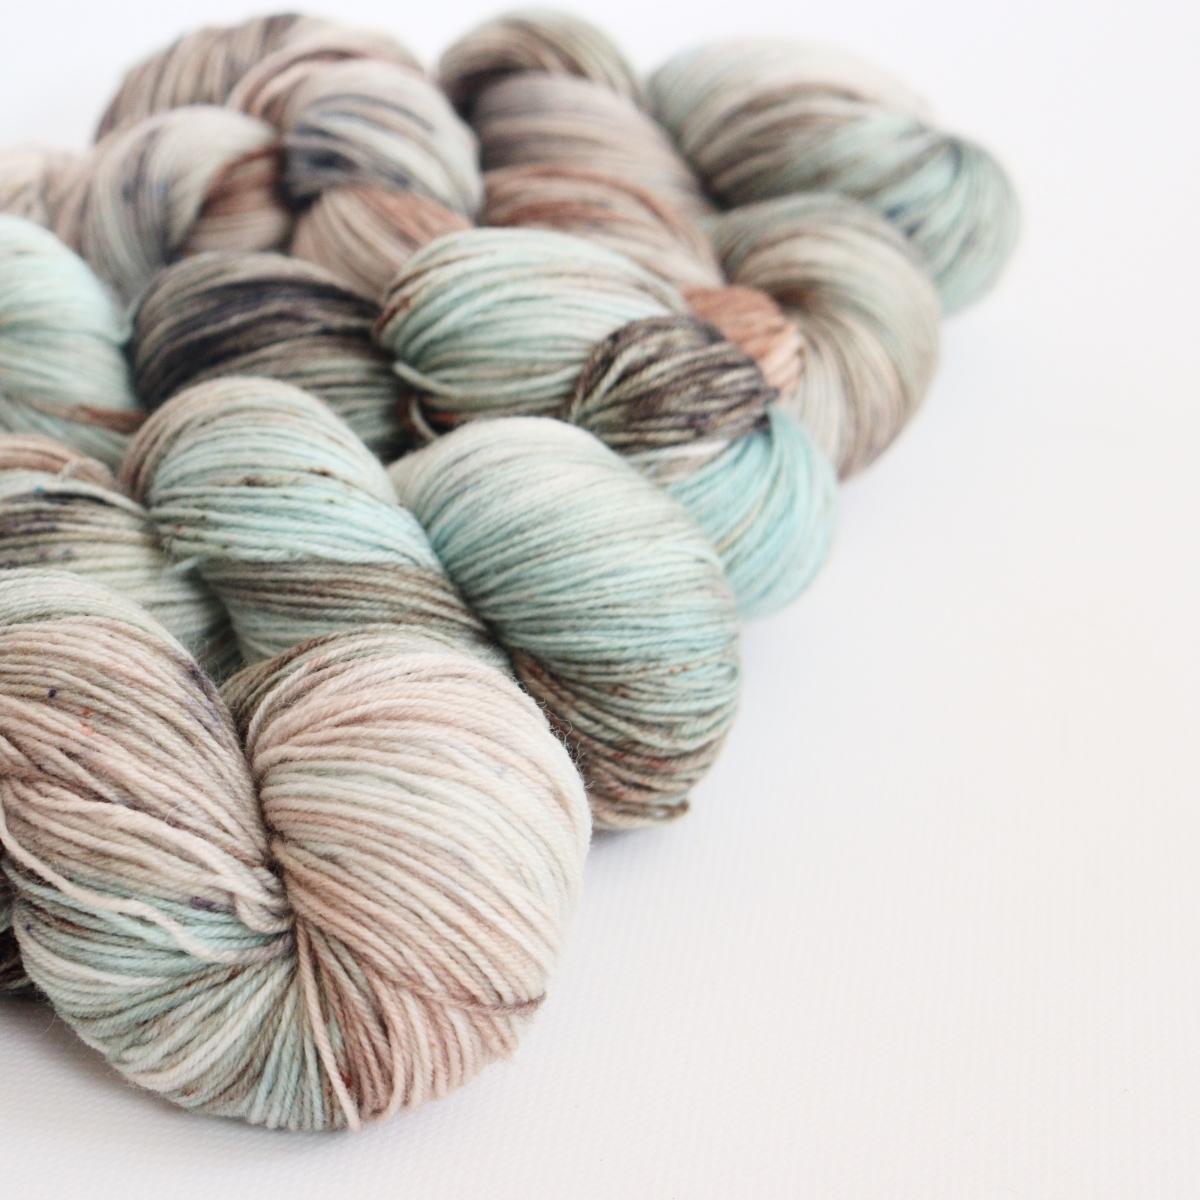 woodico.pro hand dyed yarn 055 3 1200x1200 - Hand dyed yarn / 055